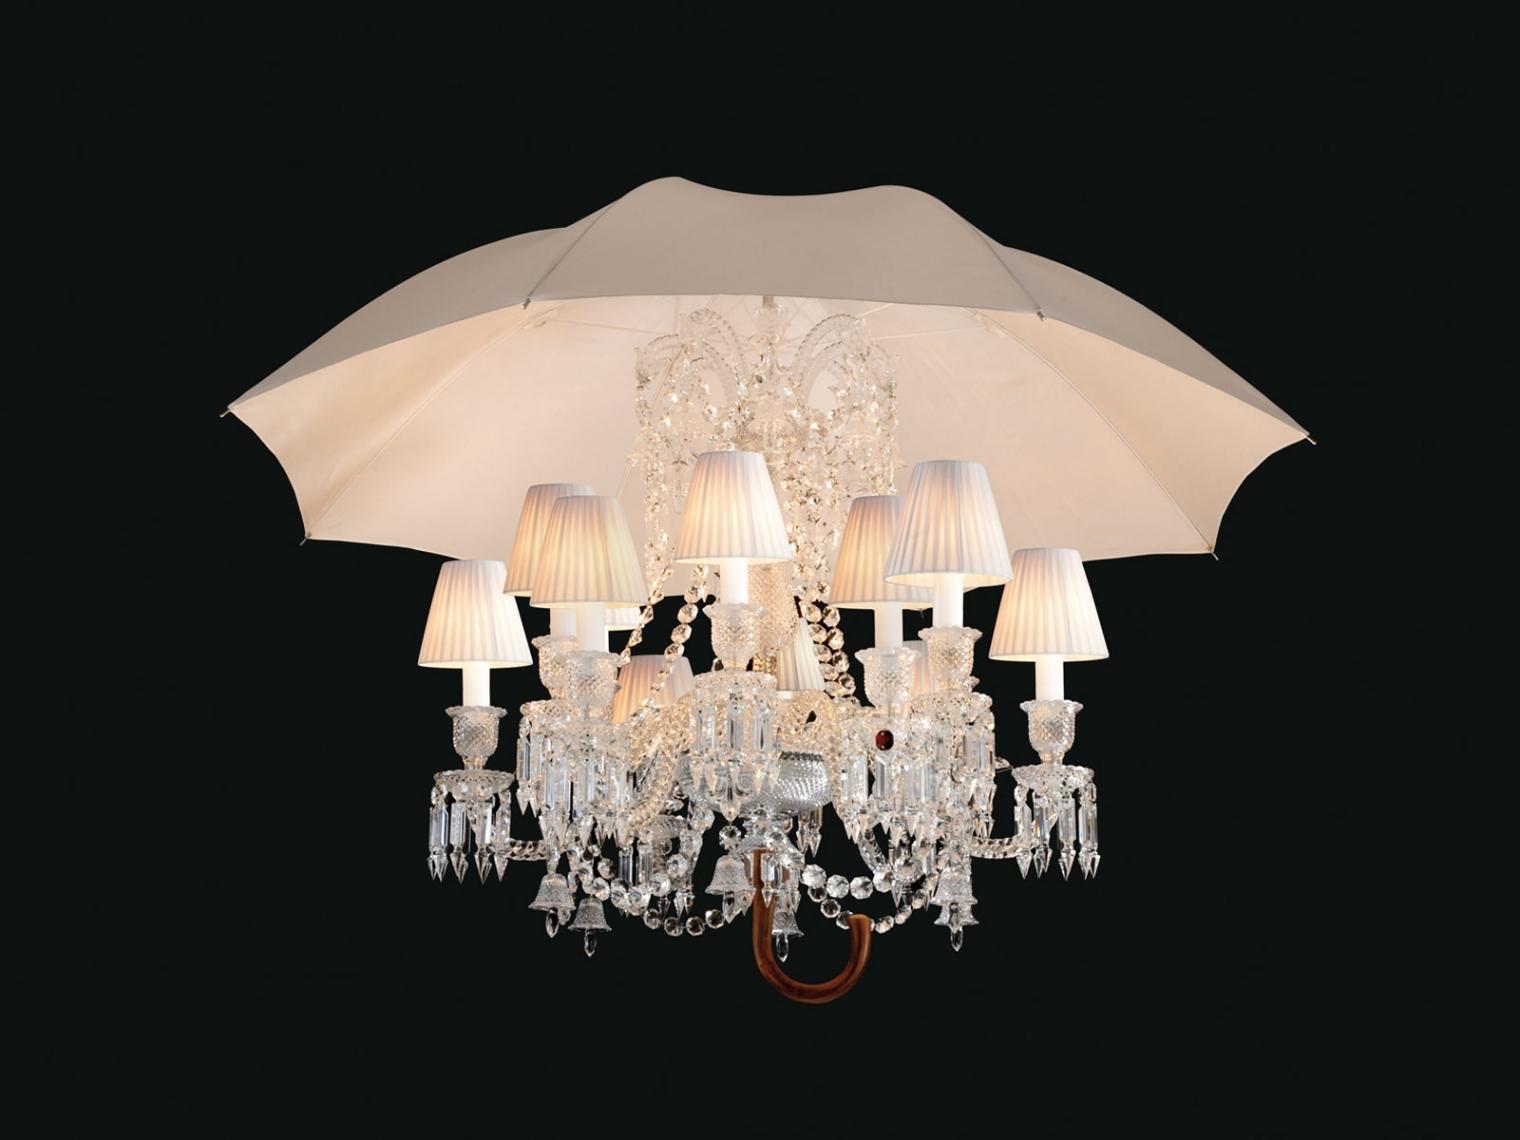 Umbrella Lamp Chandelier Baccarat Marie Coquine Chandelier, 12 Light Within Wonderful Lamp Chandelier With An Umbrella